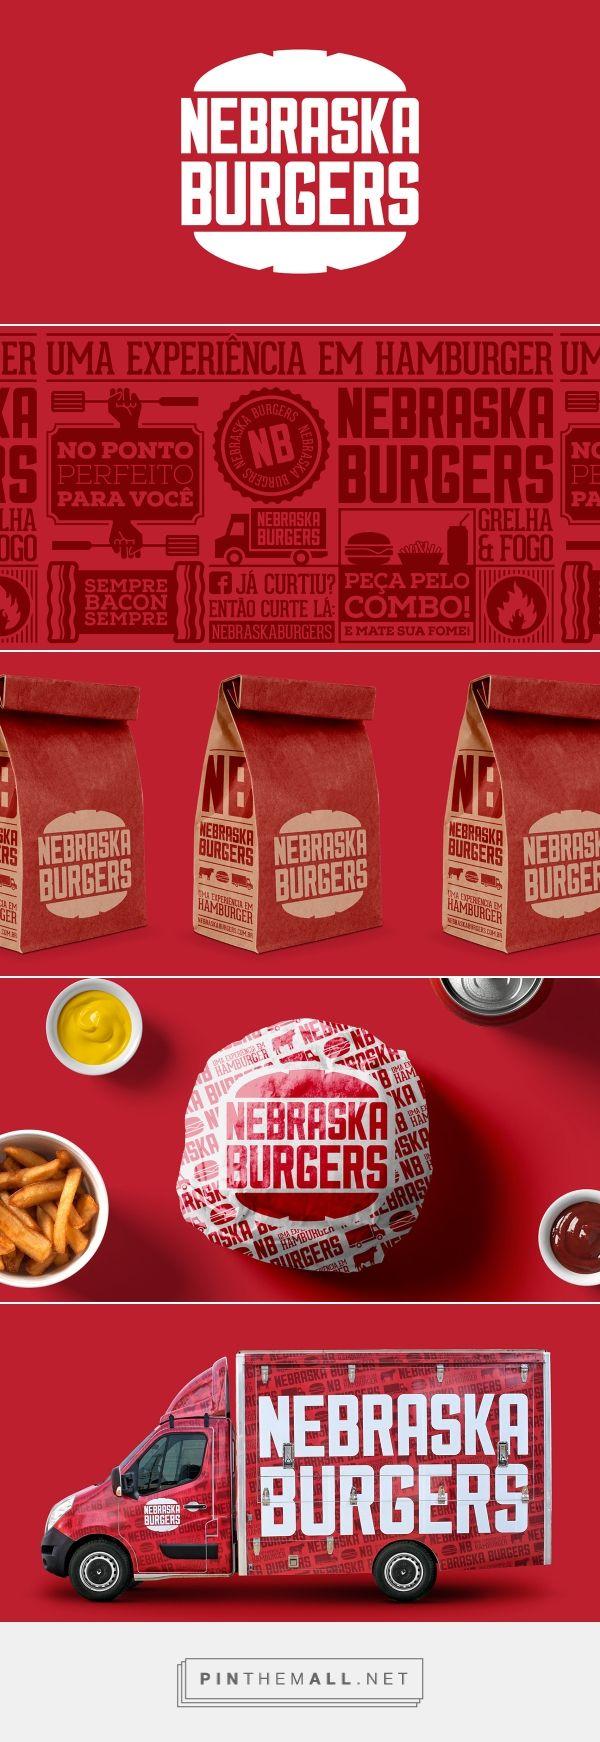 Nebraska Burgers by 095design